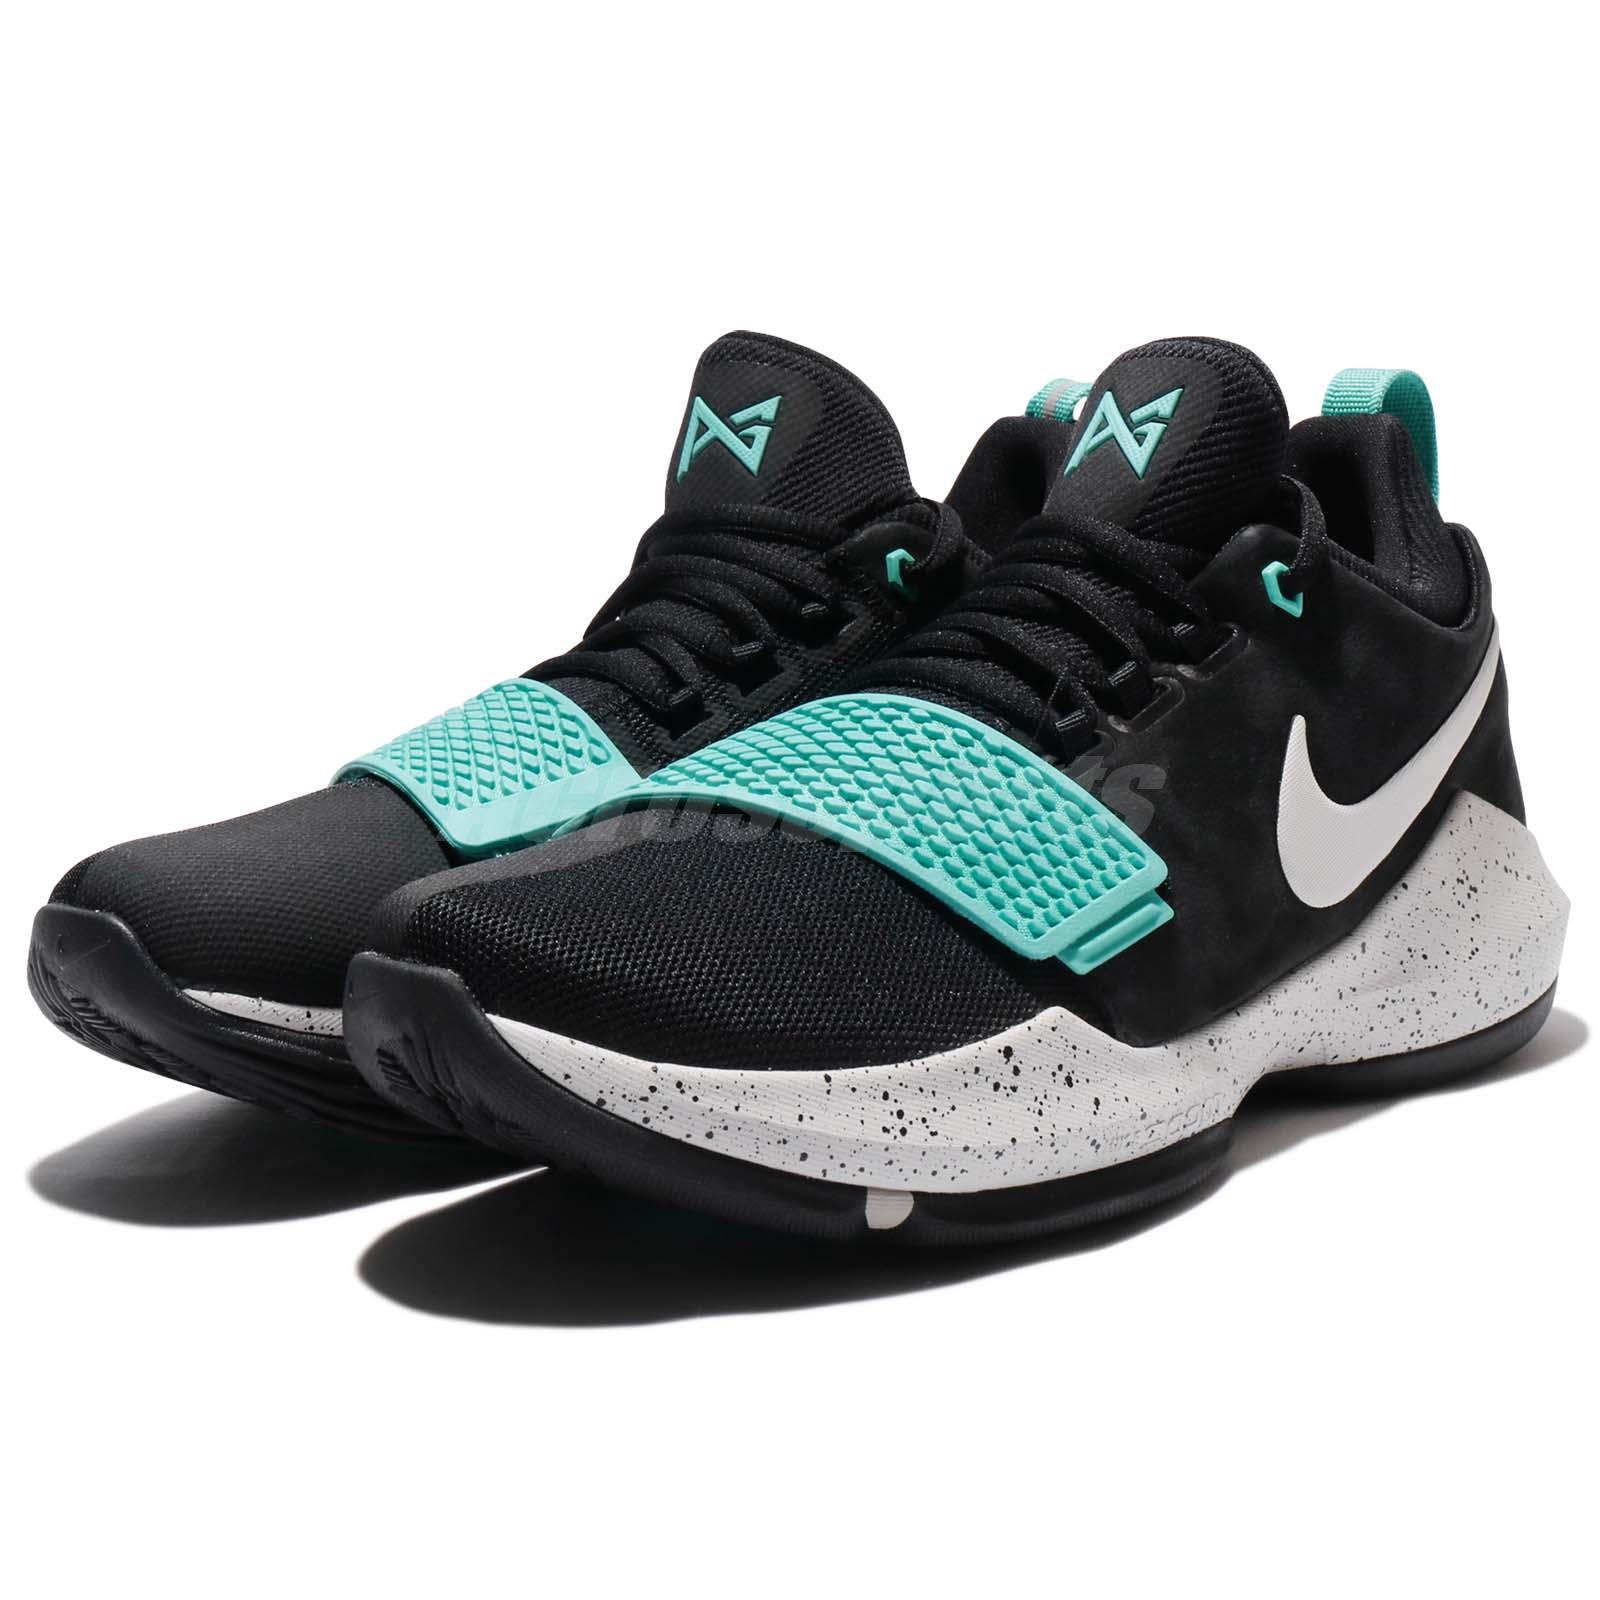 Aqua Color Basketball Shoes